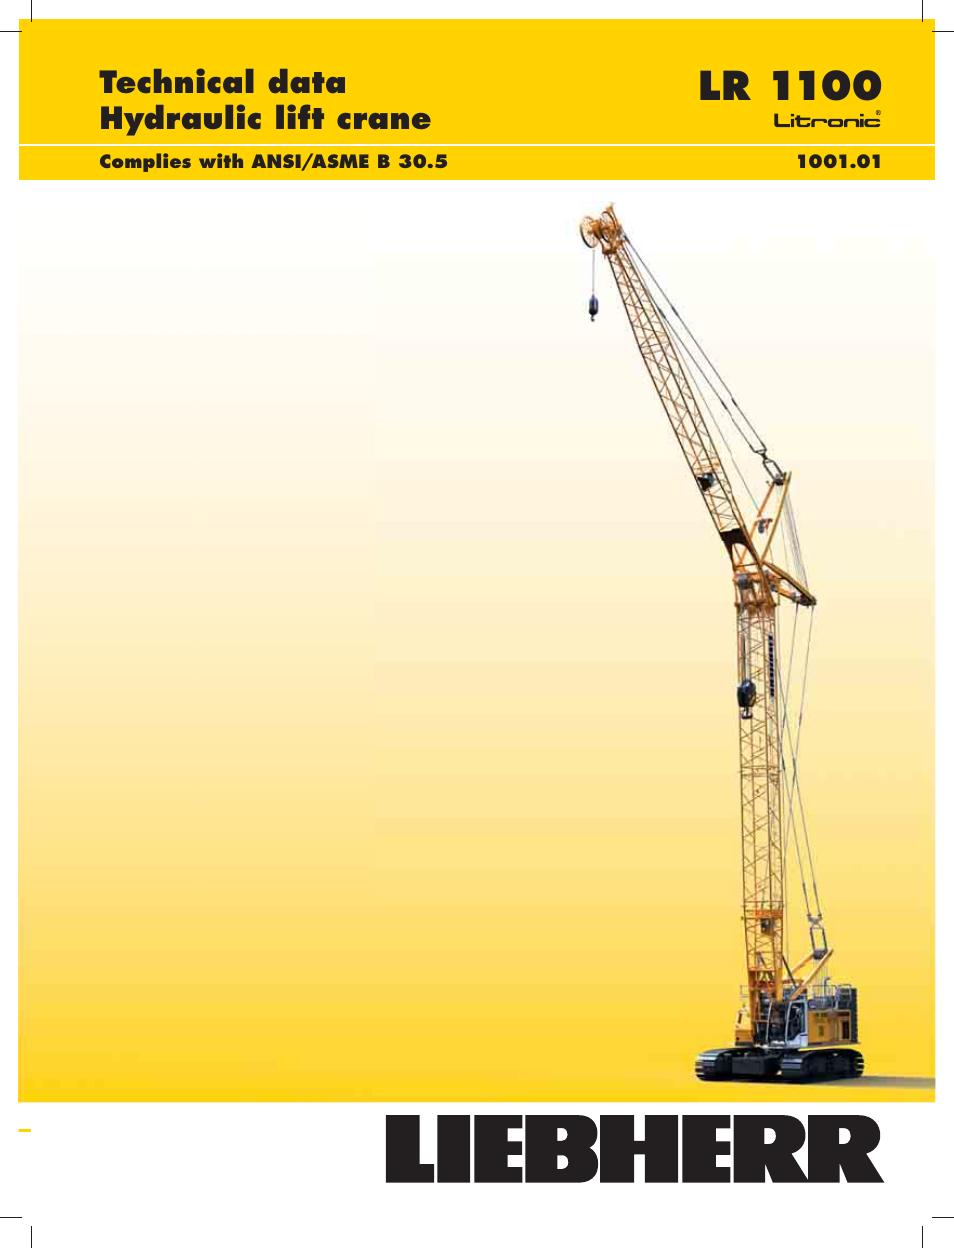 liebherr lr 1100 user manual 32 pages user manual nikon d7100 user guide for nikon d7000